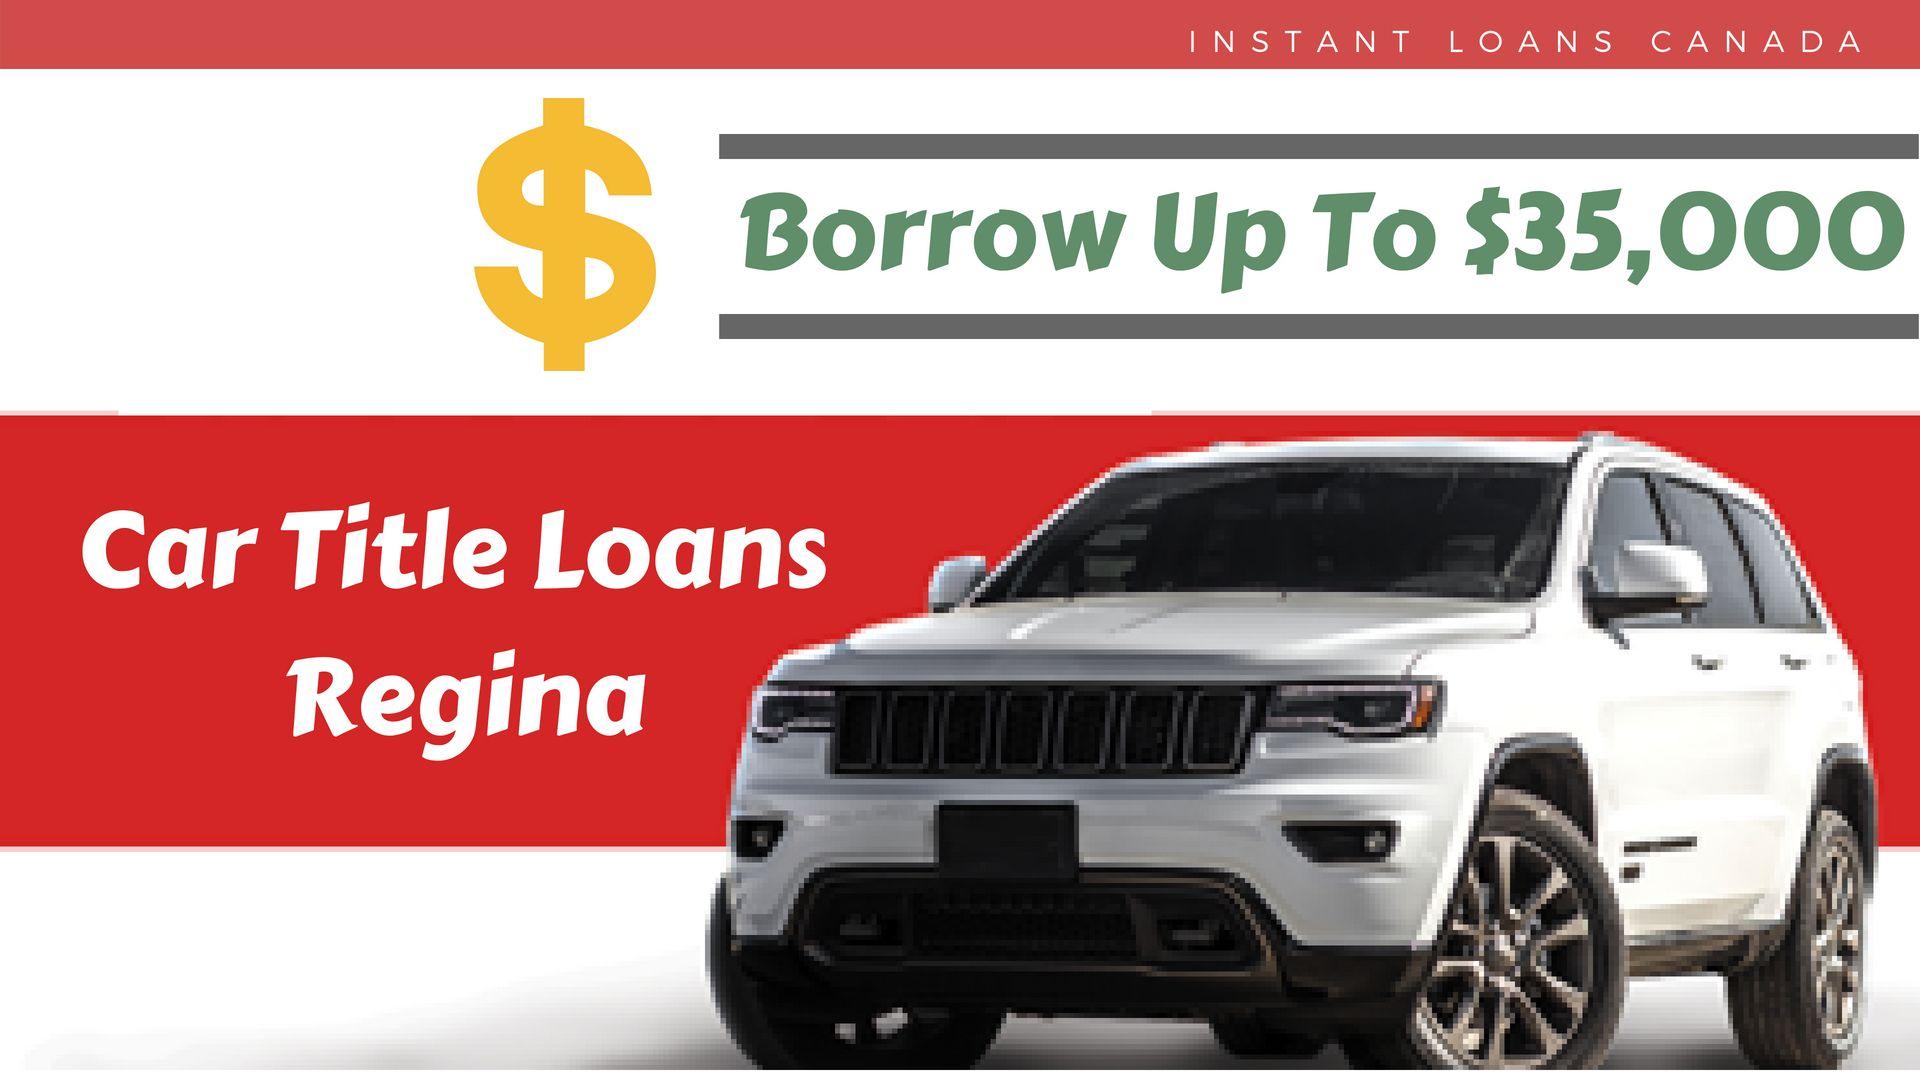 Instant Loans Canada provides Car Title loans in Regina